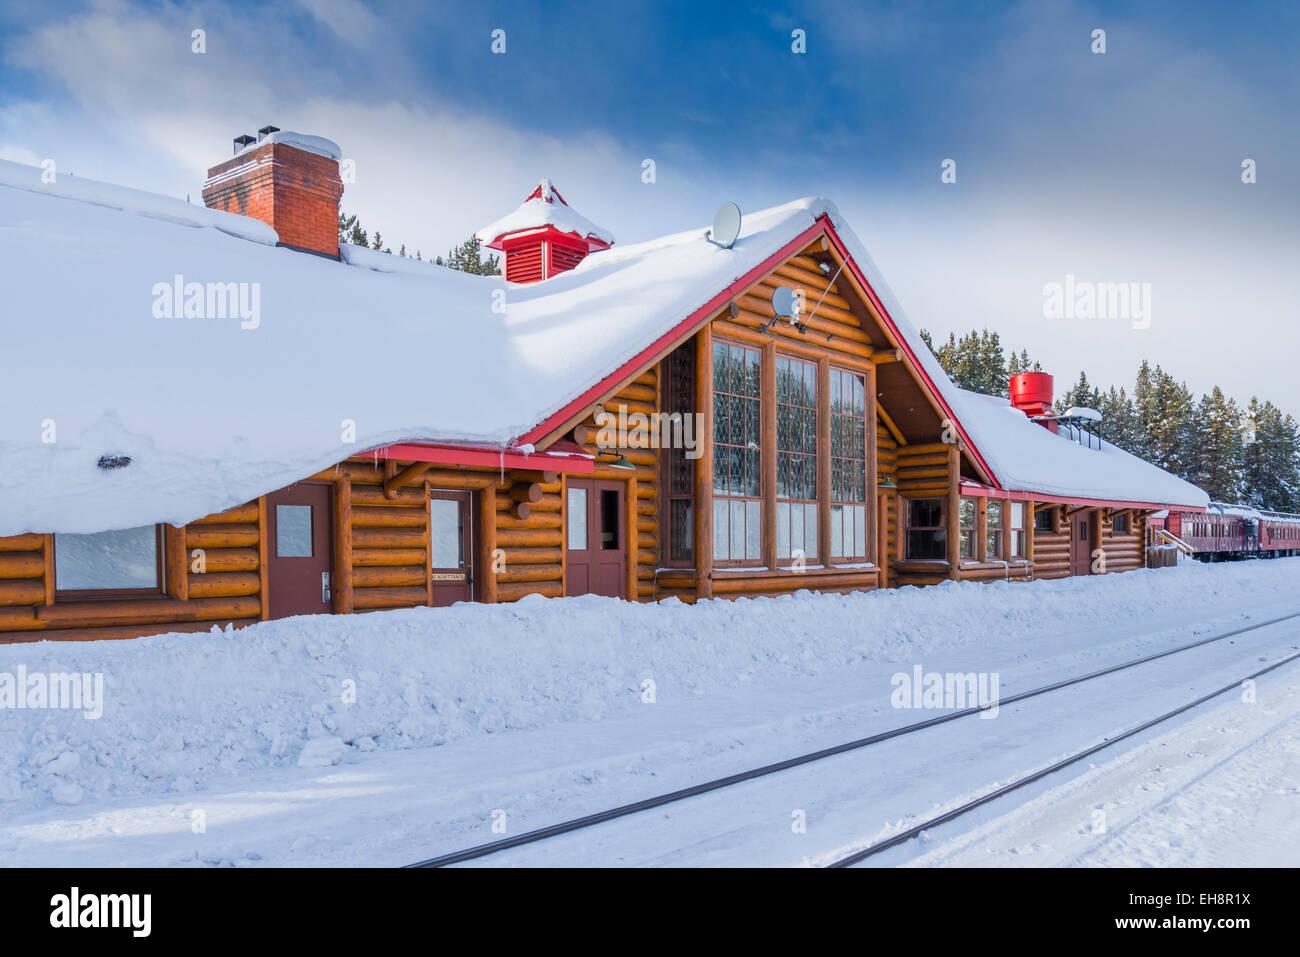 Heritage train Station, Lake Louise, Banff National Park, Alberta, Canada - Stock Image